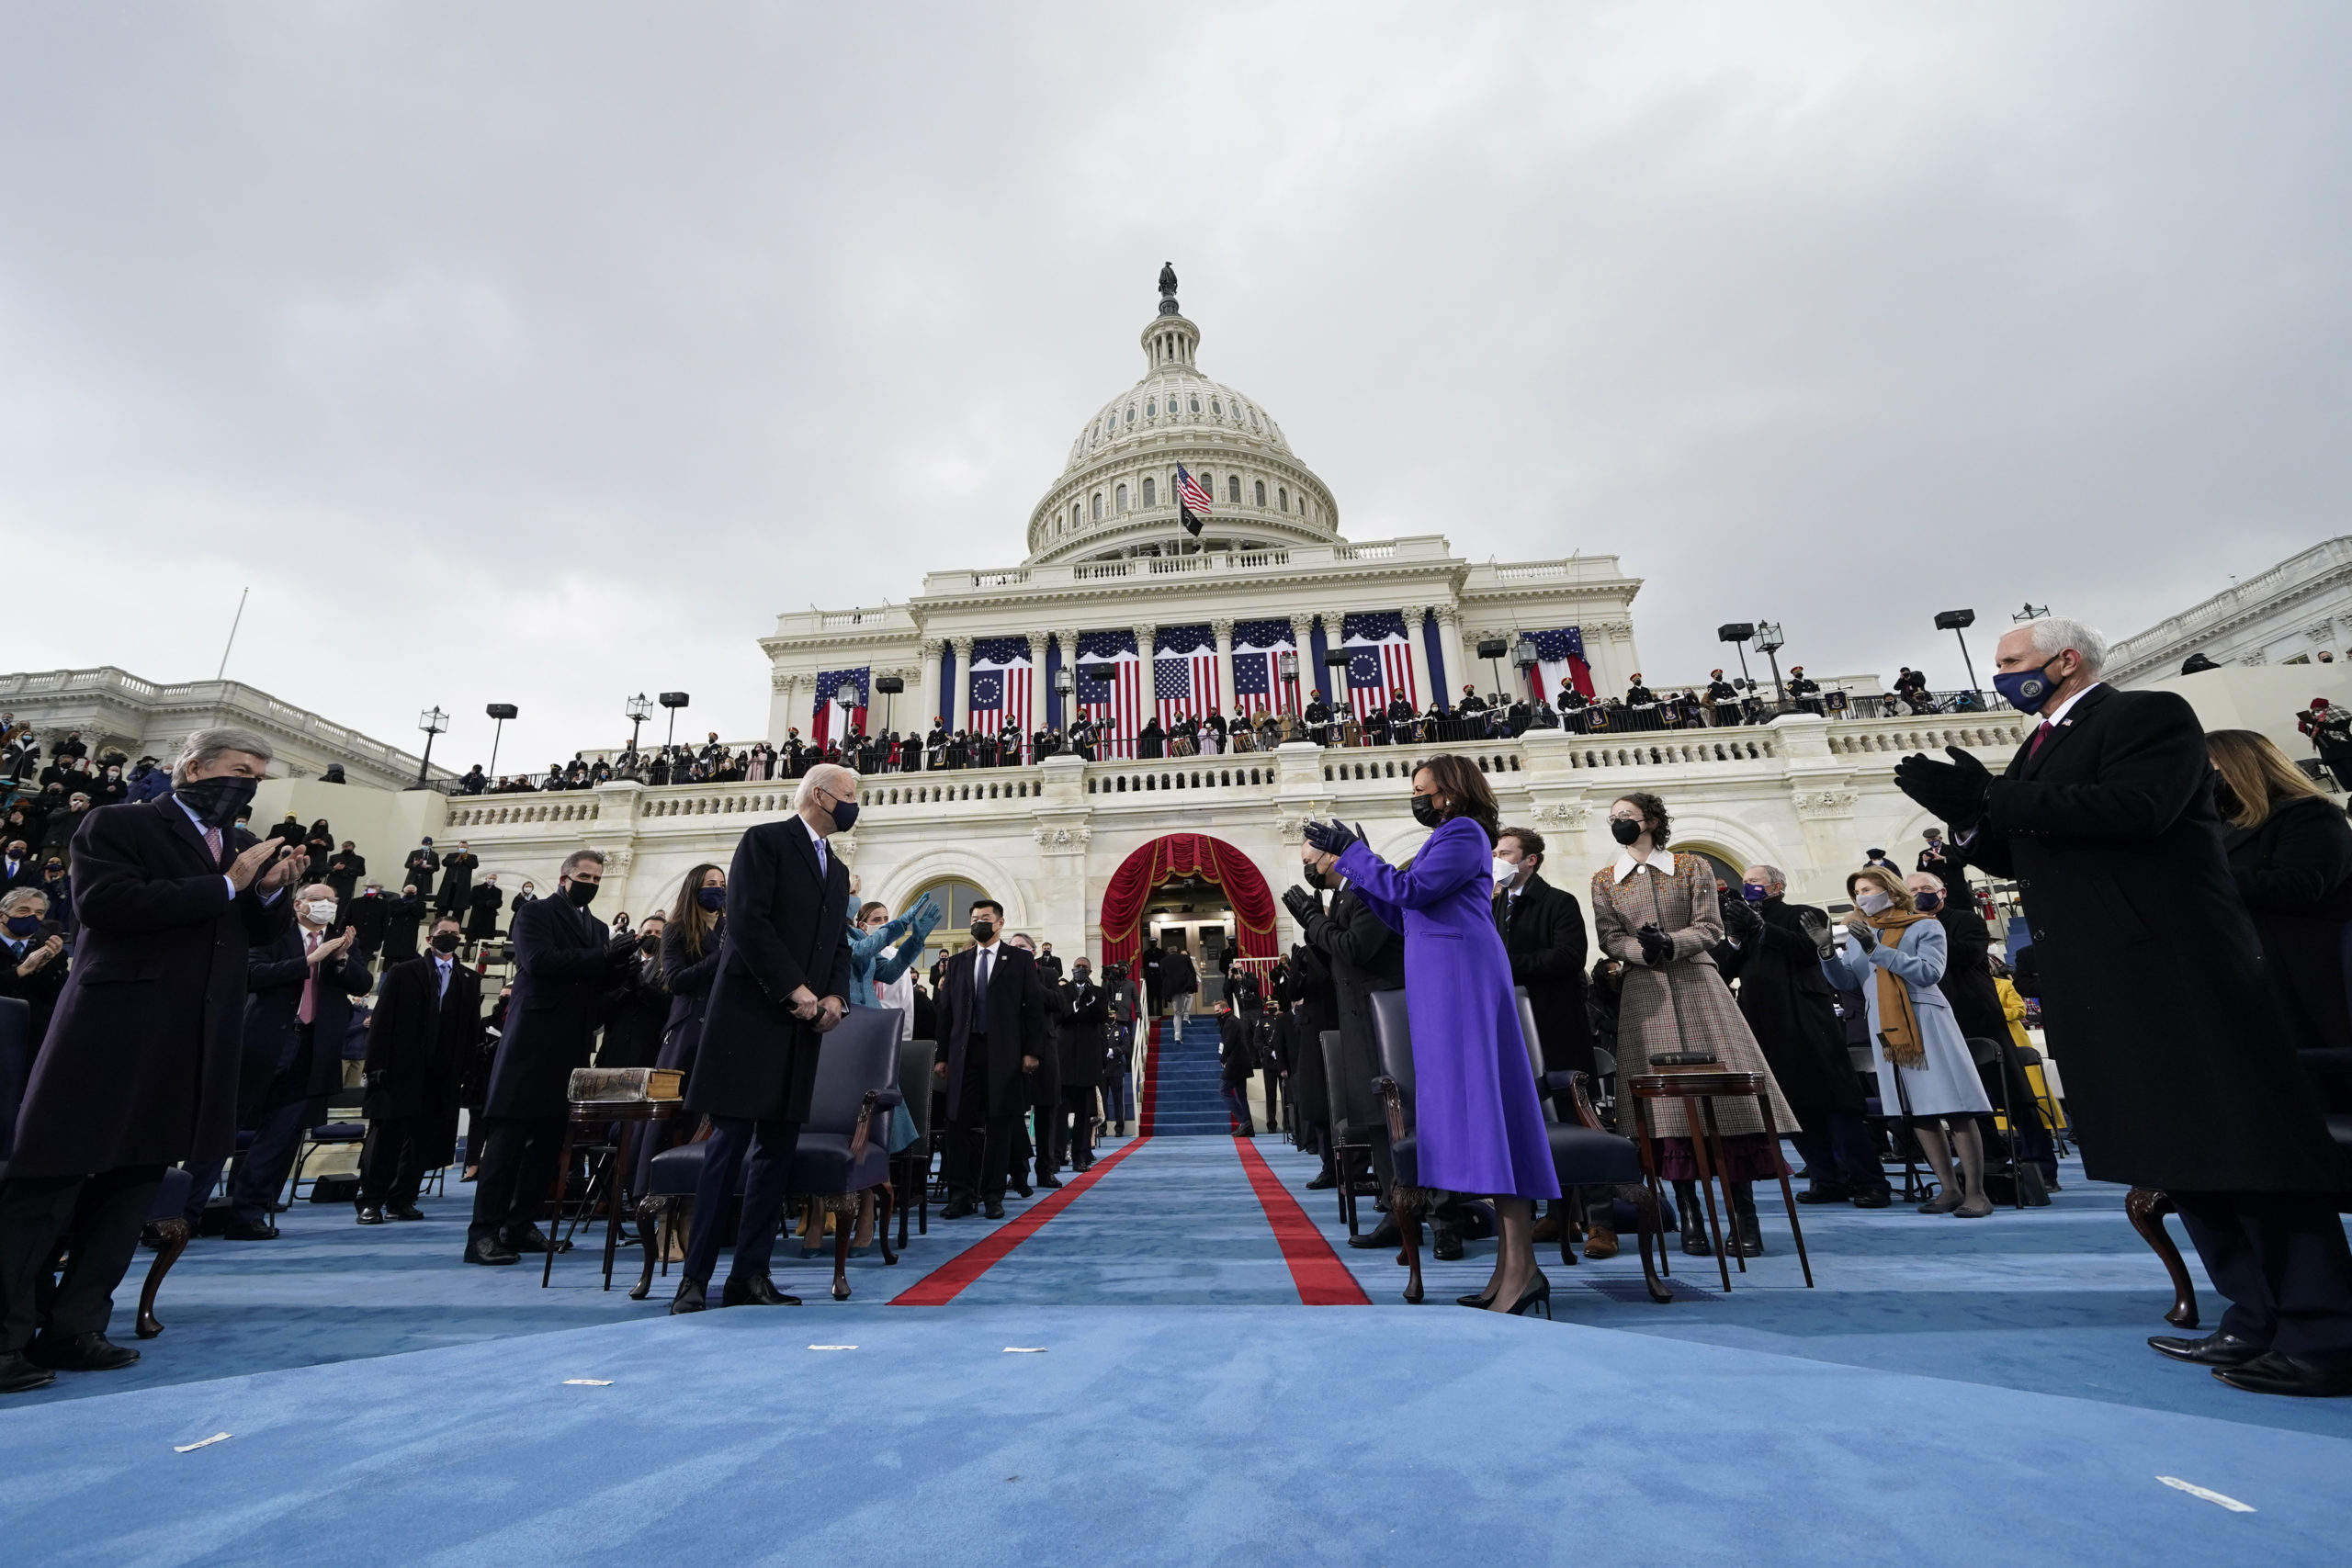 Vice President Kamala Harris applauds President Joe Biden at the U.S. Capitol on Wednesday. (Andrew Harnik/Pool/Getty Images)